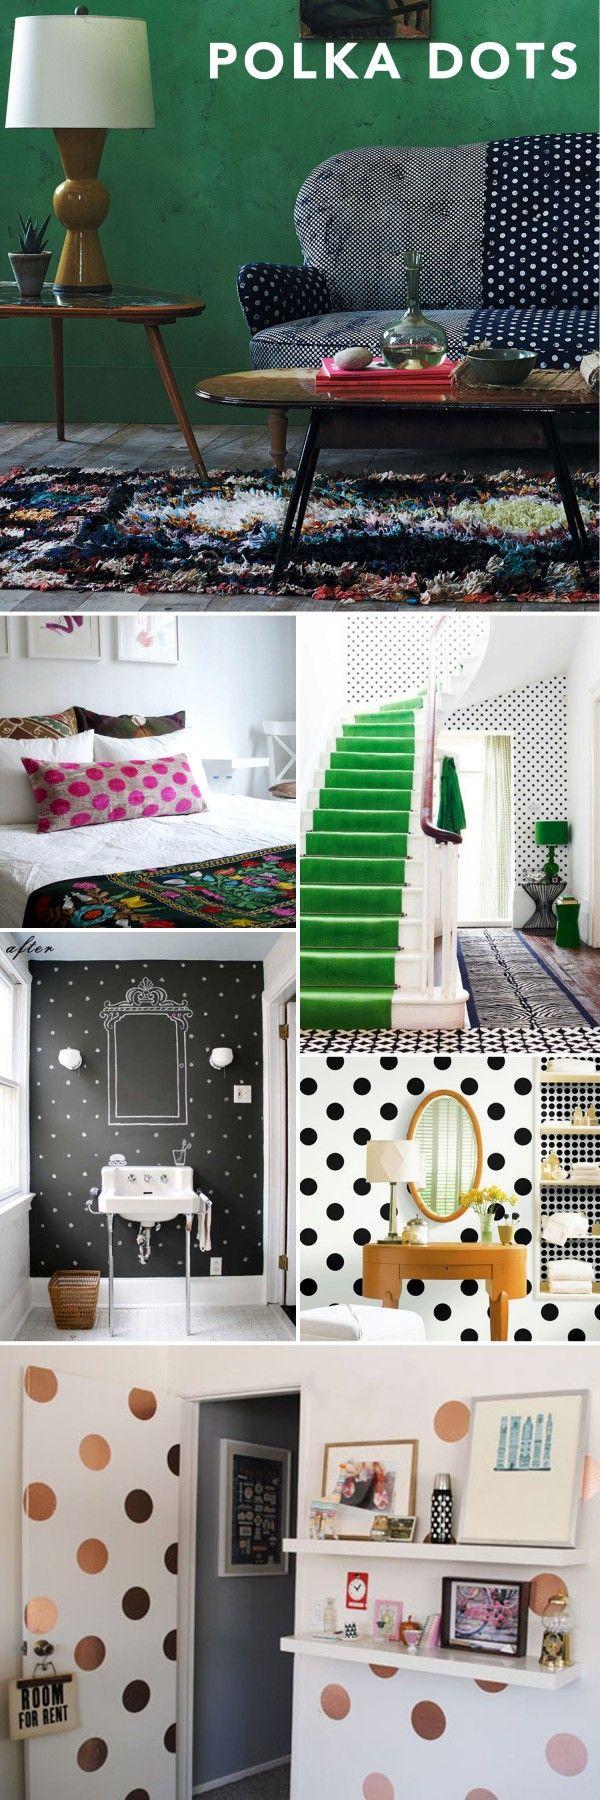 Interior Style File: Polka Dots